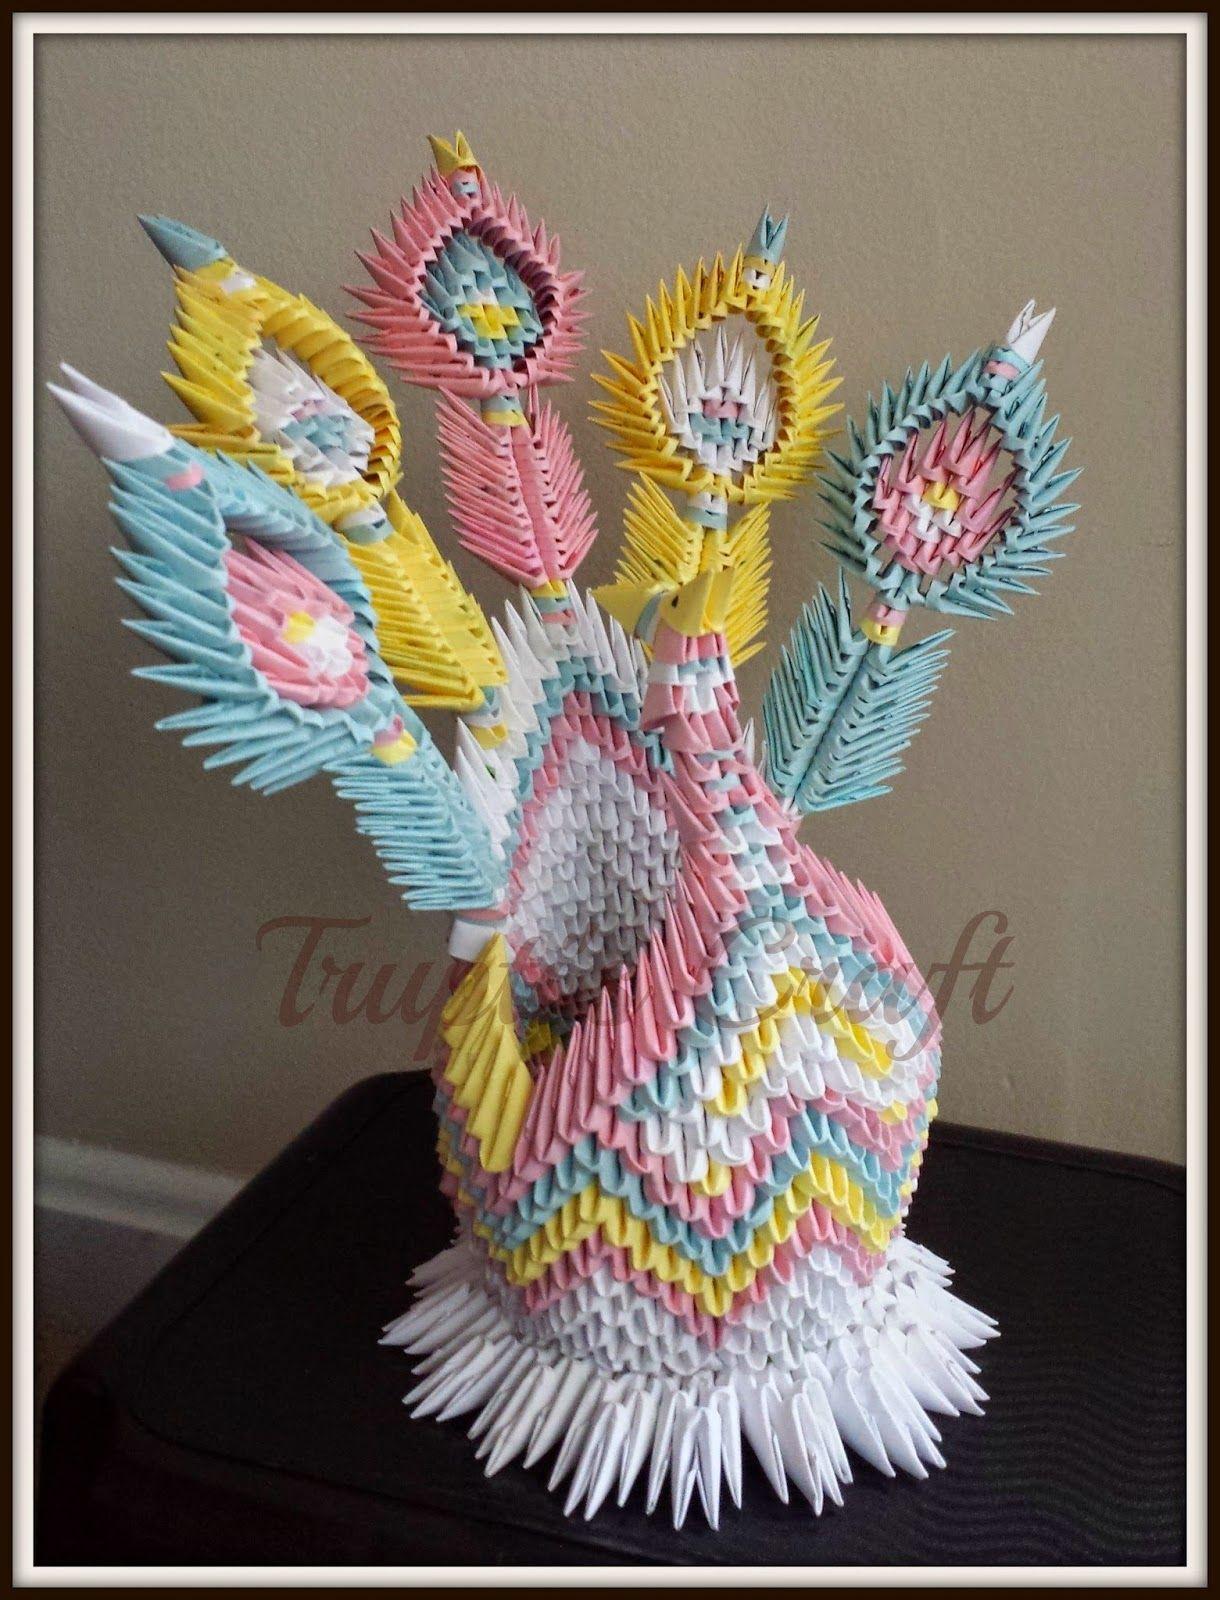 peacock bird diagram fsk modulation and demodulation block trupti 39s craft 3d origami tavuskuşu